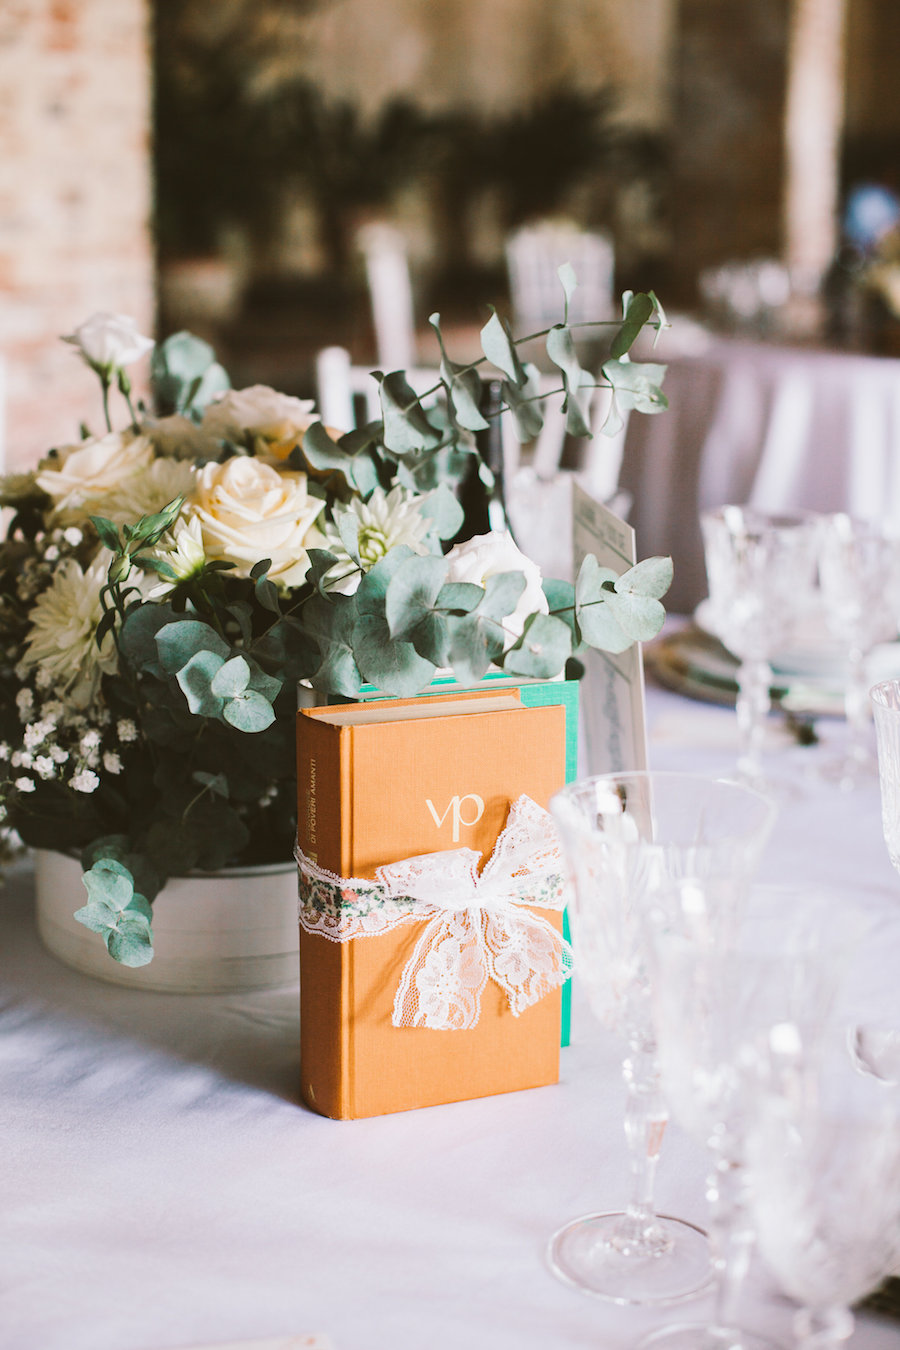 Matrimonio Tema Letterario : Un matrimonio vintage e letterario wedding wonderland